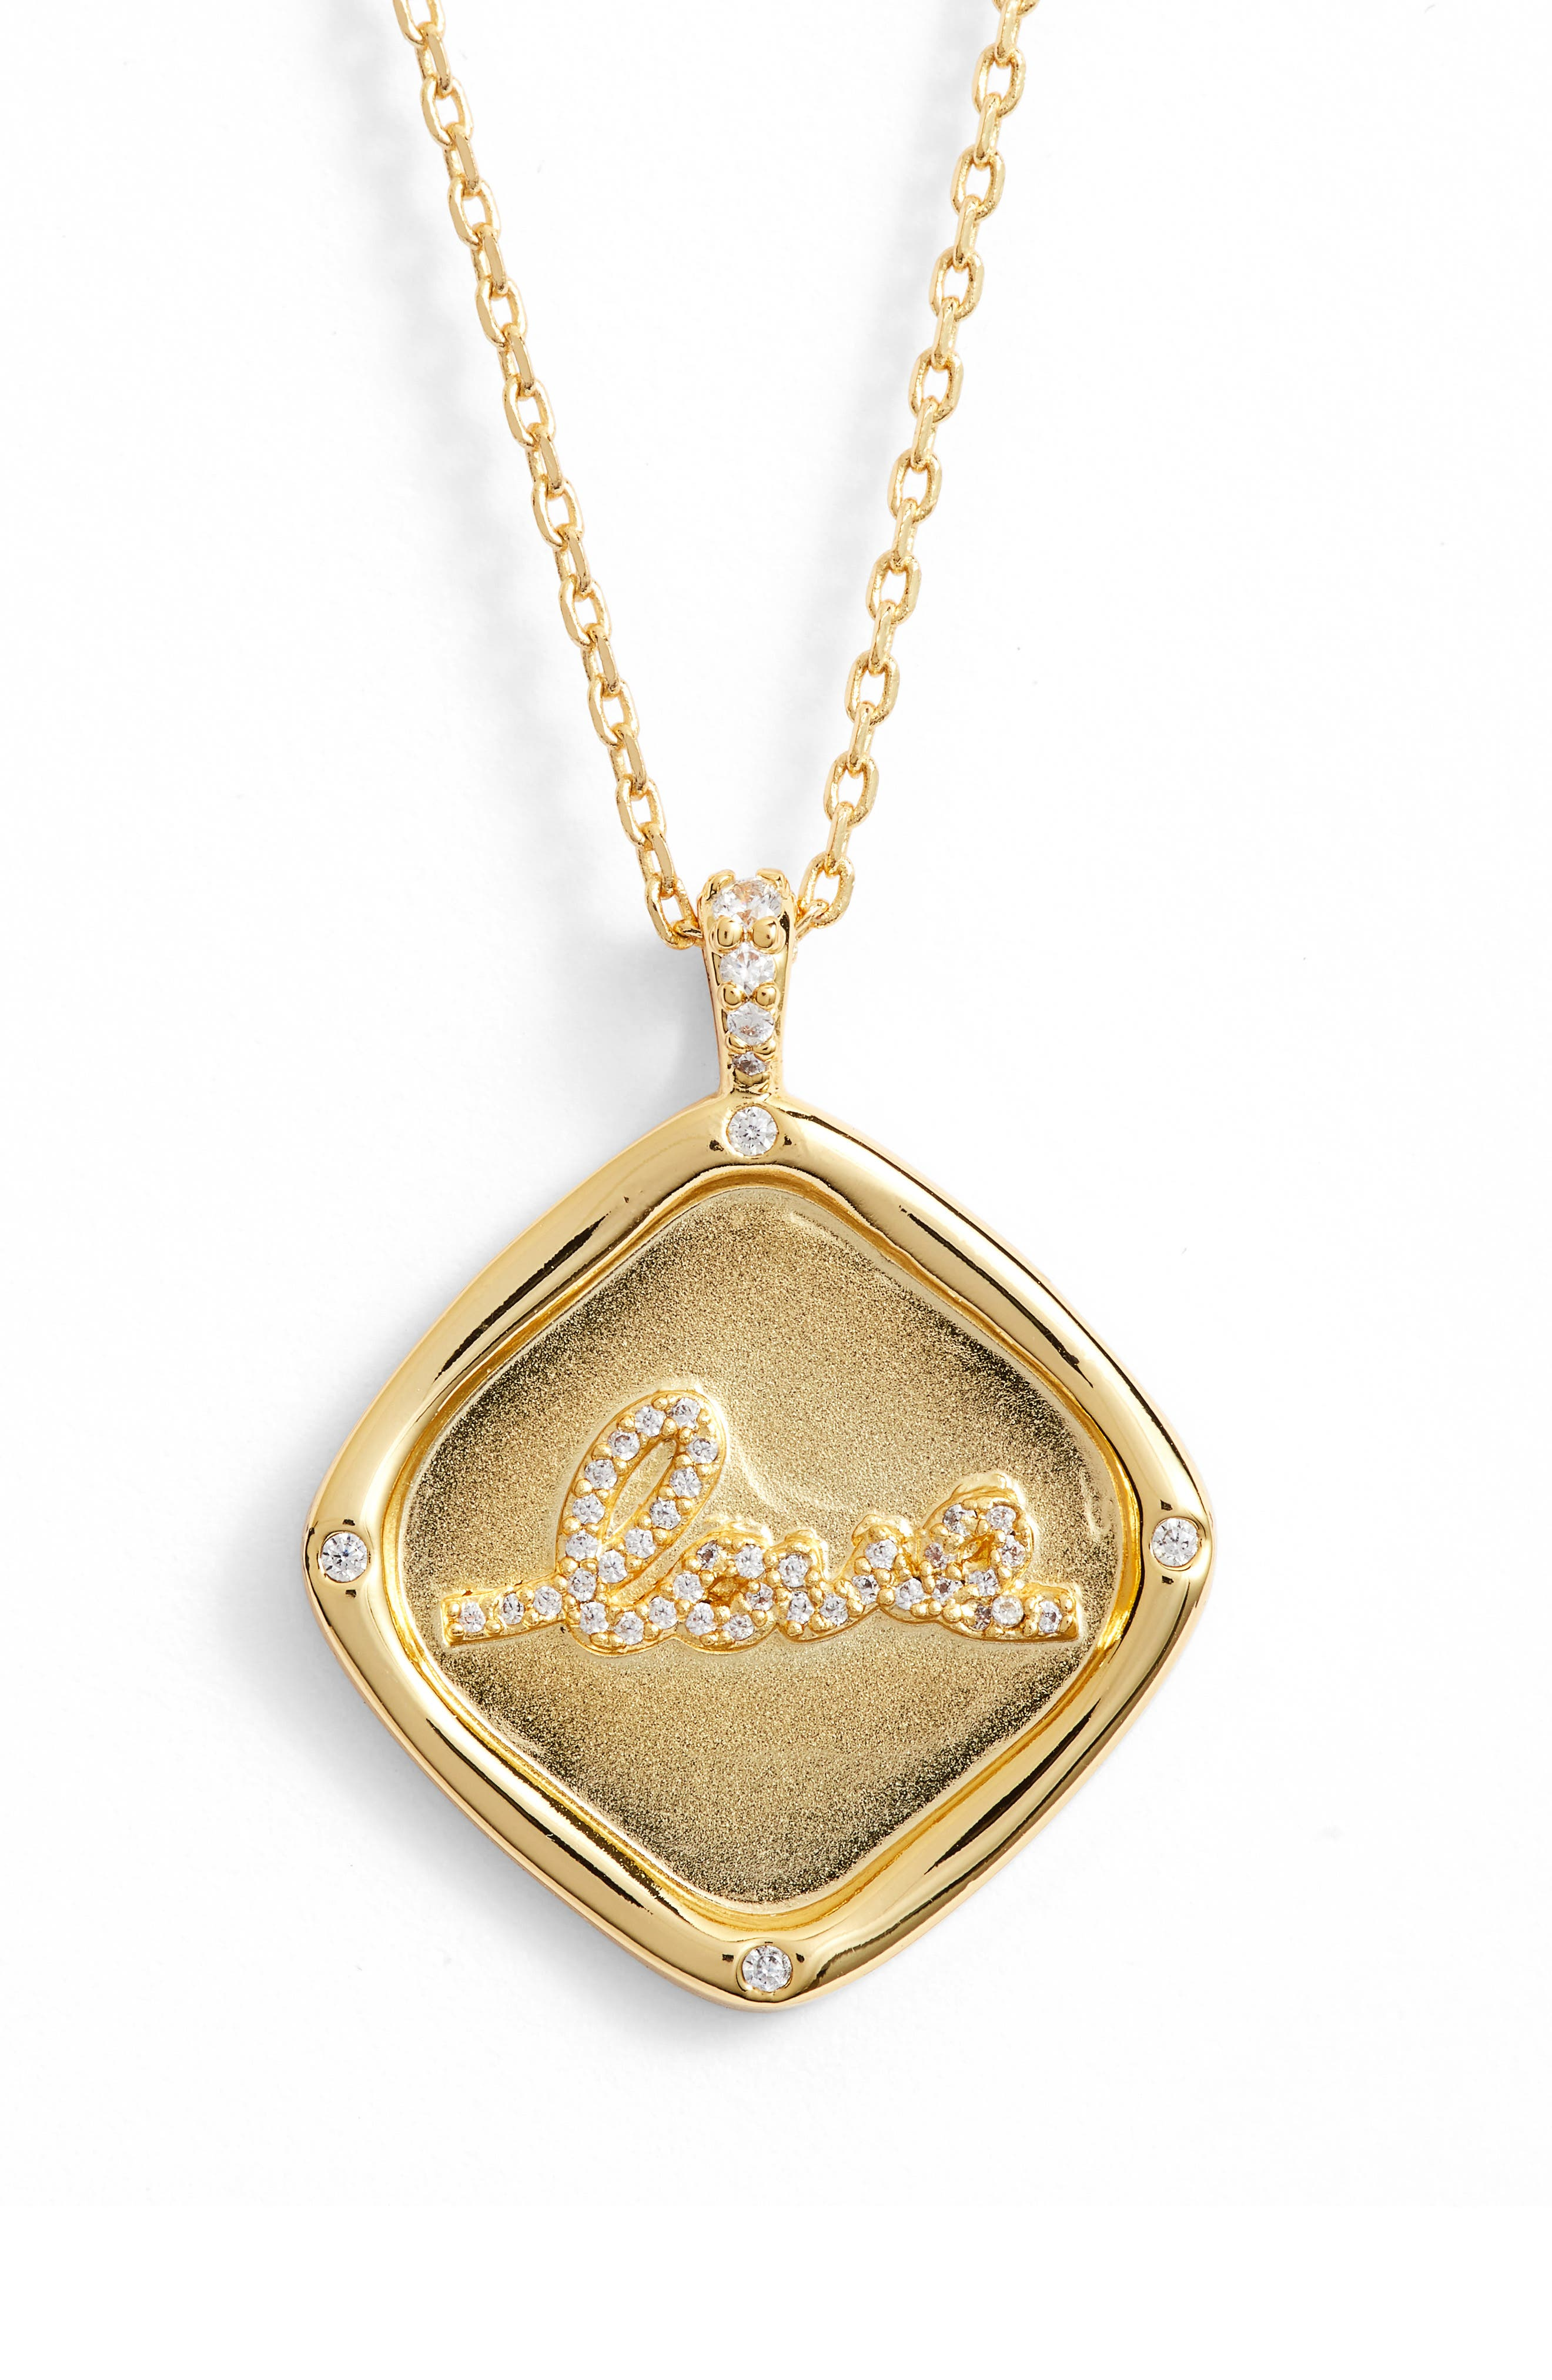 LULU DK Love Crystal Pendant Necklace in Gold